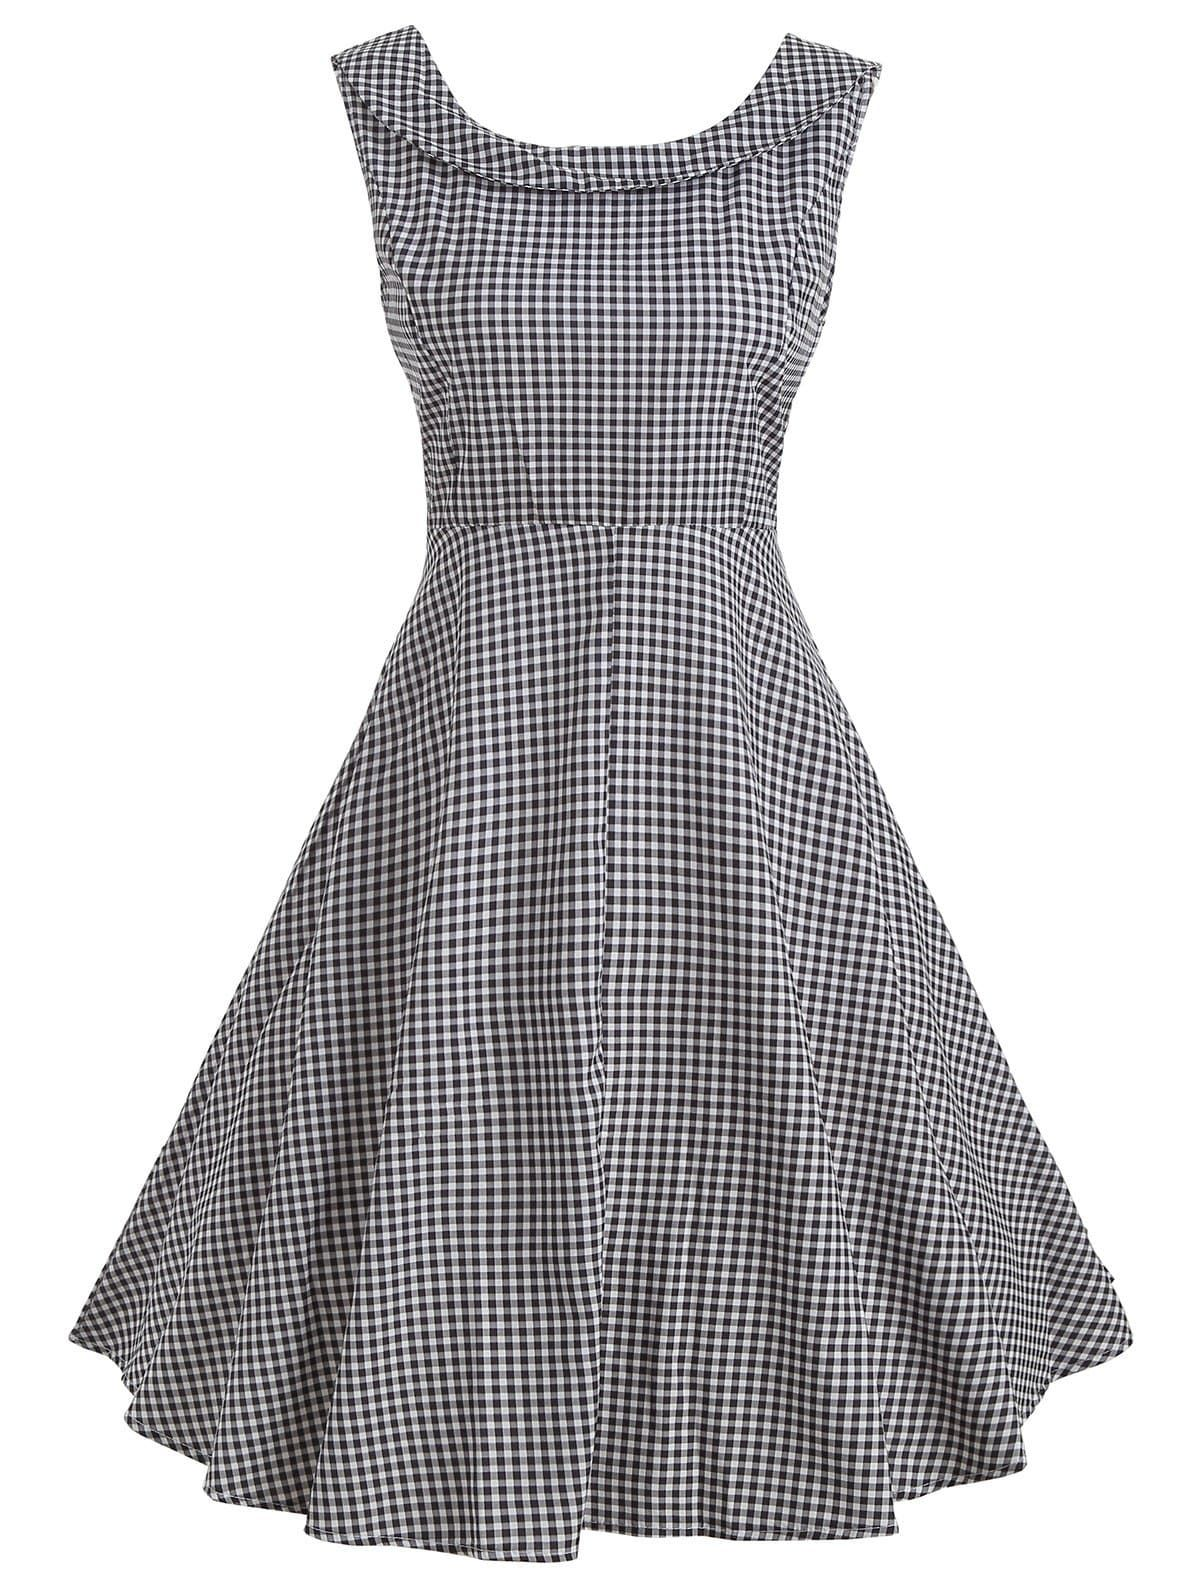 Sleeveless Knee Length Vintage Checked Dress Dresses Retro Dress Vintage Dresses Cheap